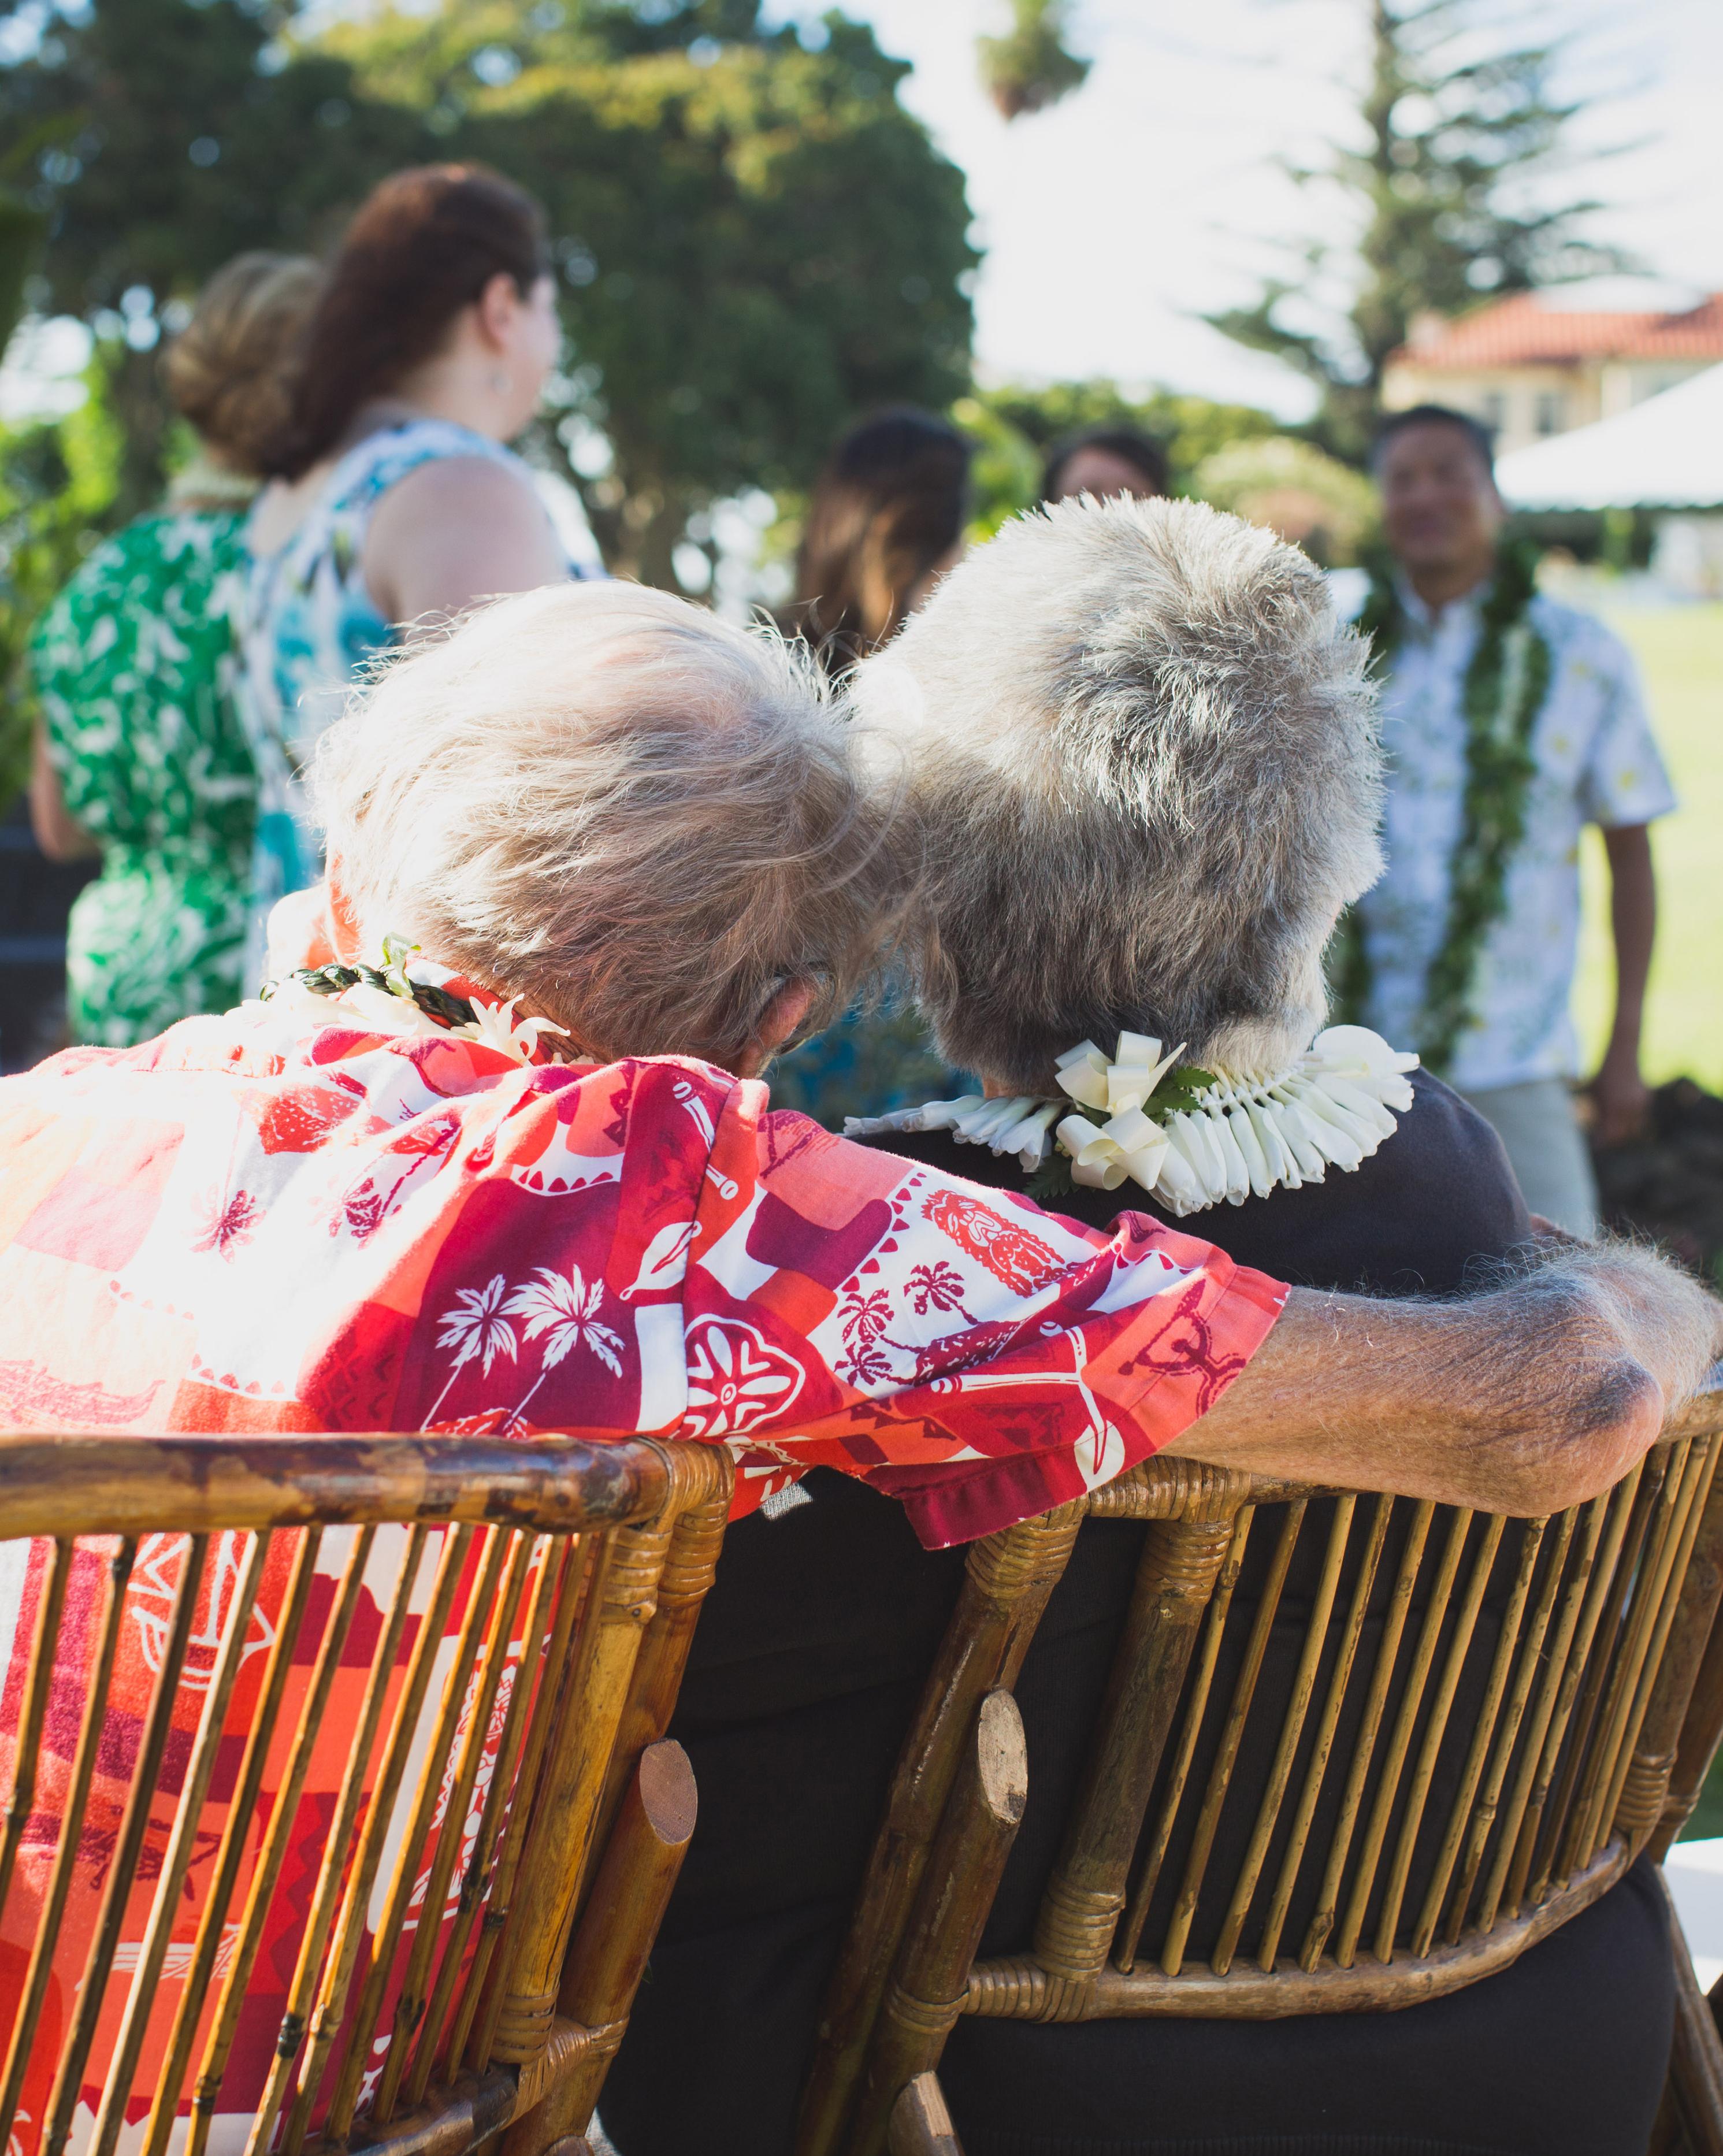 Grandparents Sitting Together at Ceremony